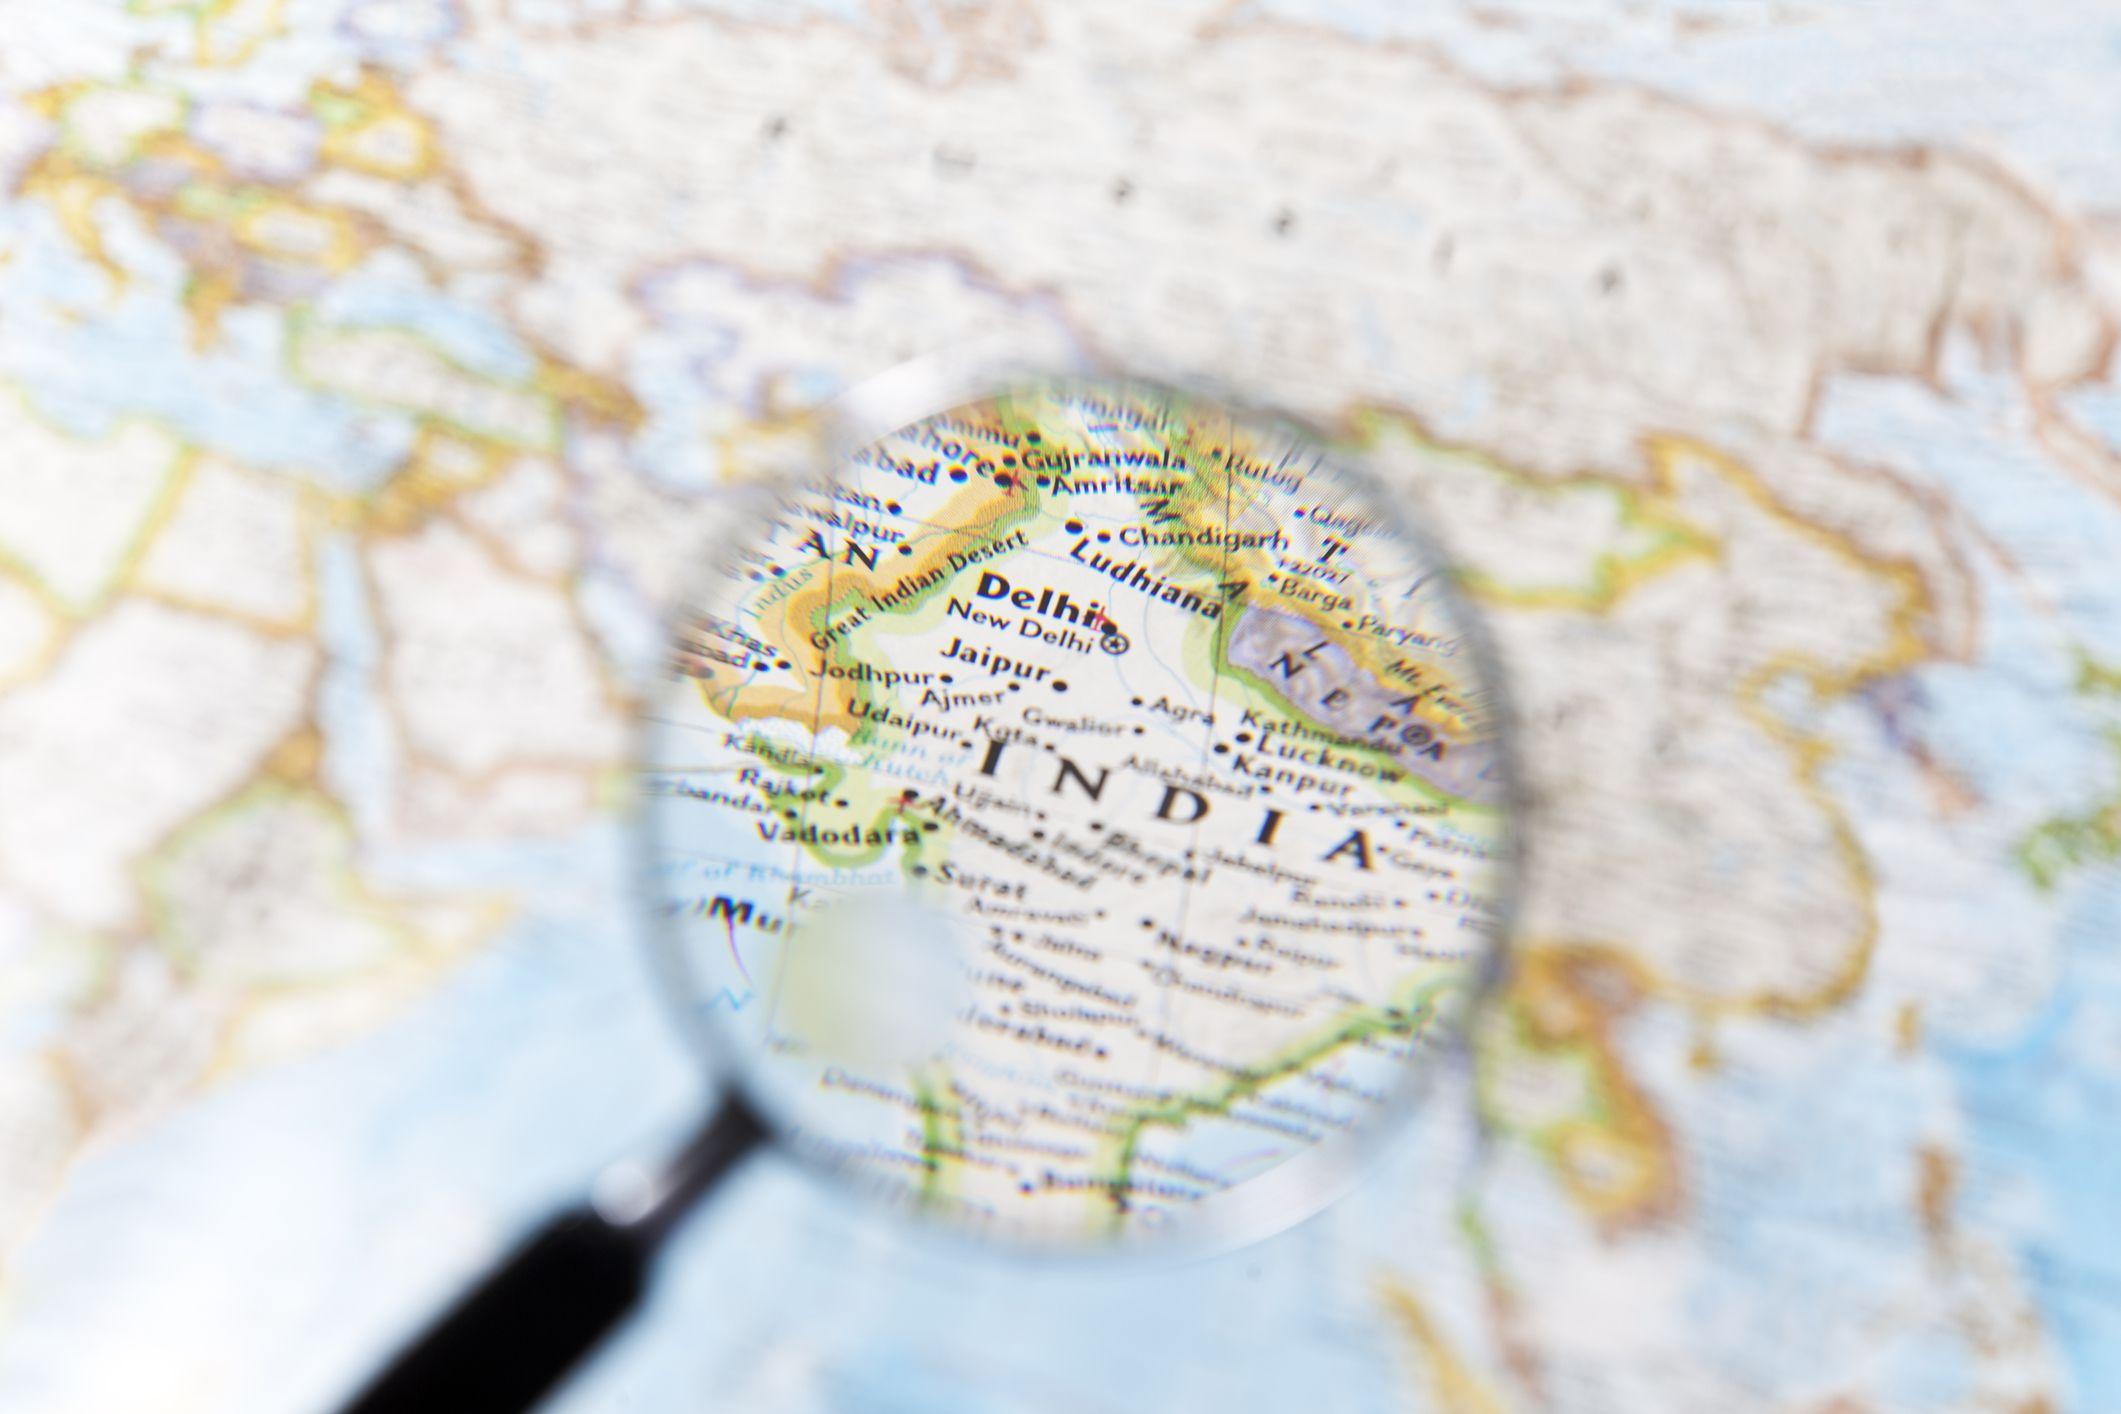 Indian E-Visa Information: What to Know and How to Apply on animal map usa, argentina map usa, germany map usa, honduras map usa, pakistan map usa, afghanistan map usa, southern colonies map usa, tropical rainforest map usa, el nino map usa, fiji map usa, arctic ocean map usa, pacific ocean map usa, spain map usa, nepal map usa, russia map usa, ecology map usa, san andreas fault map usa, cuba map usa, murder map usa, tahiti map usa,